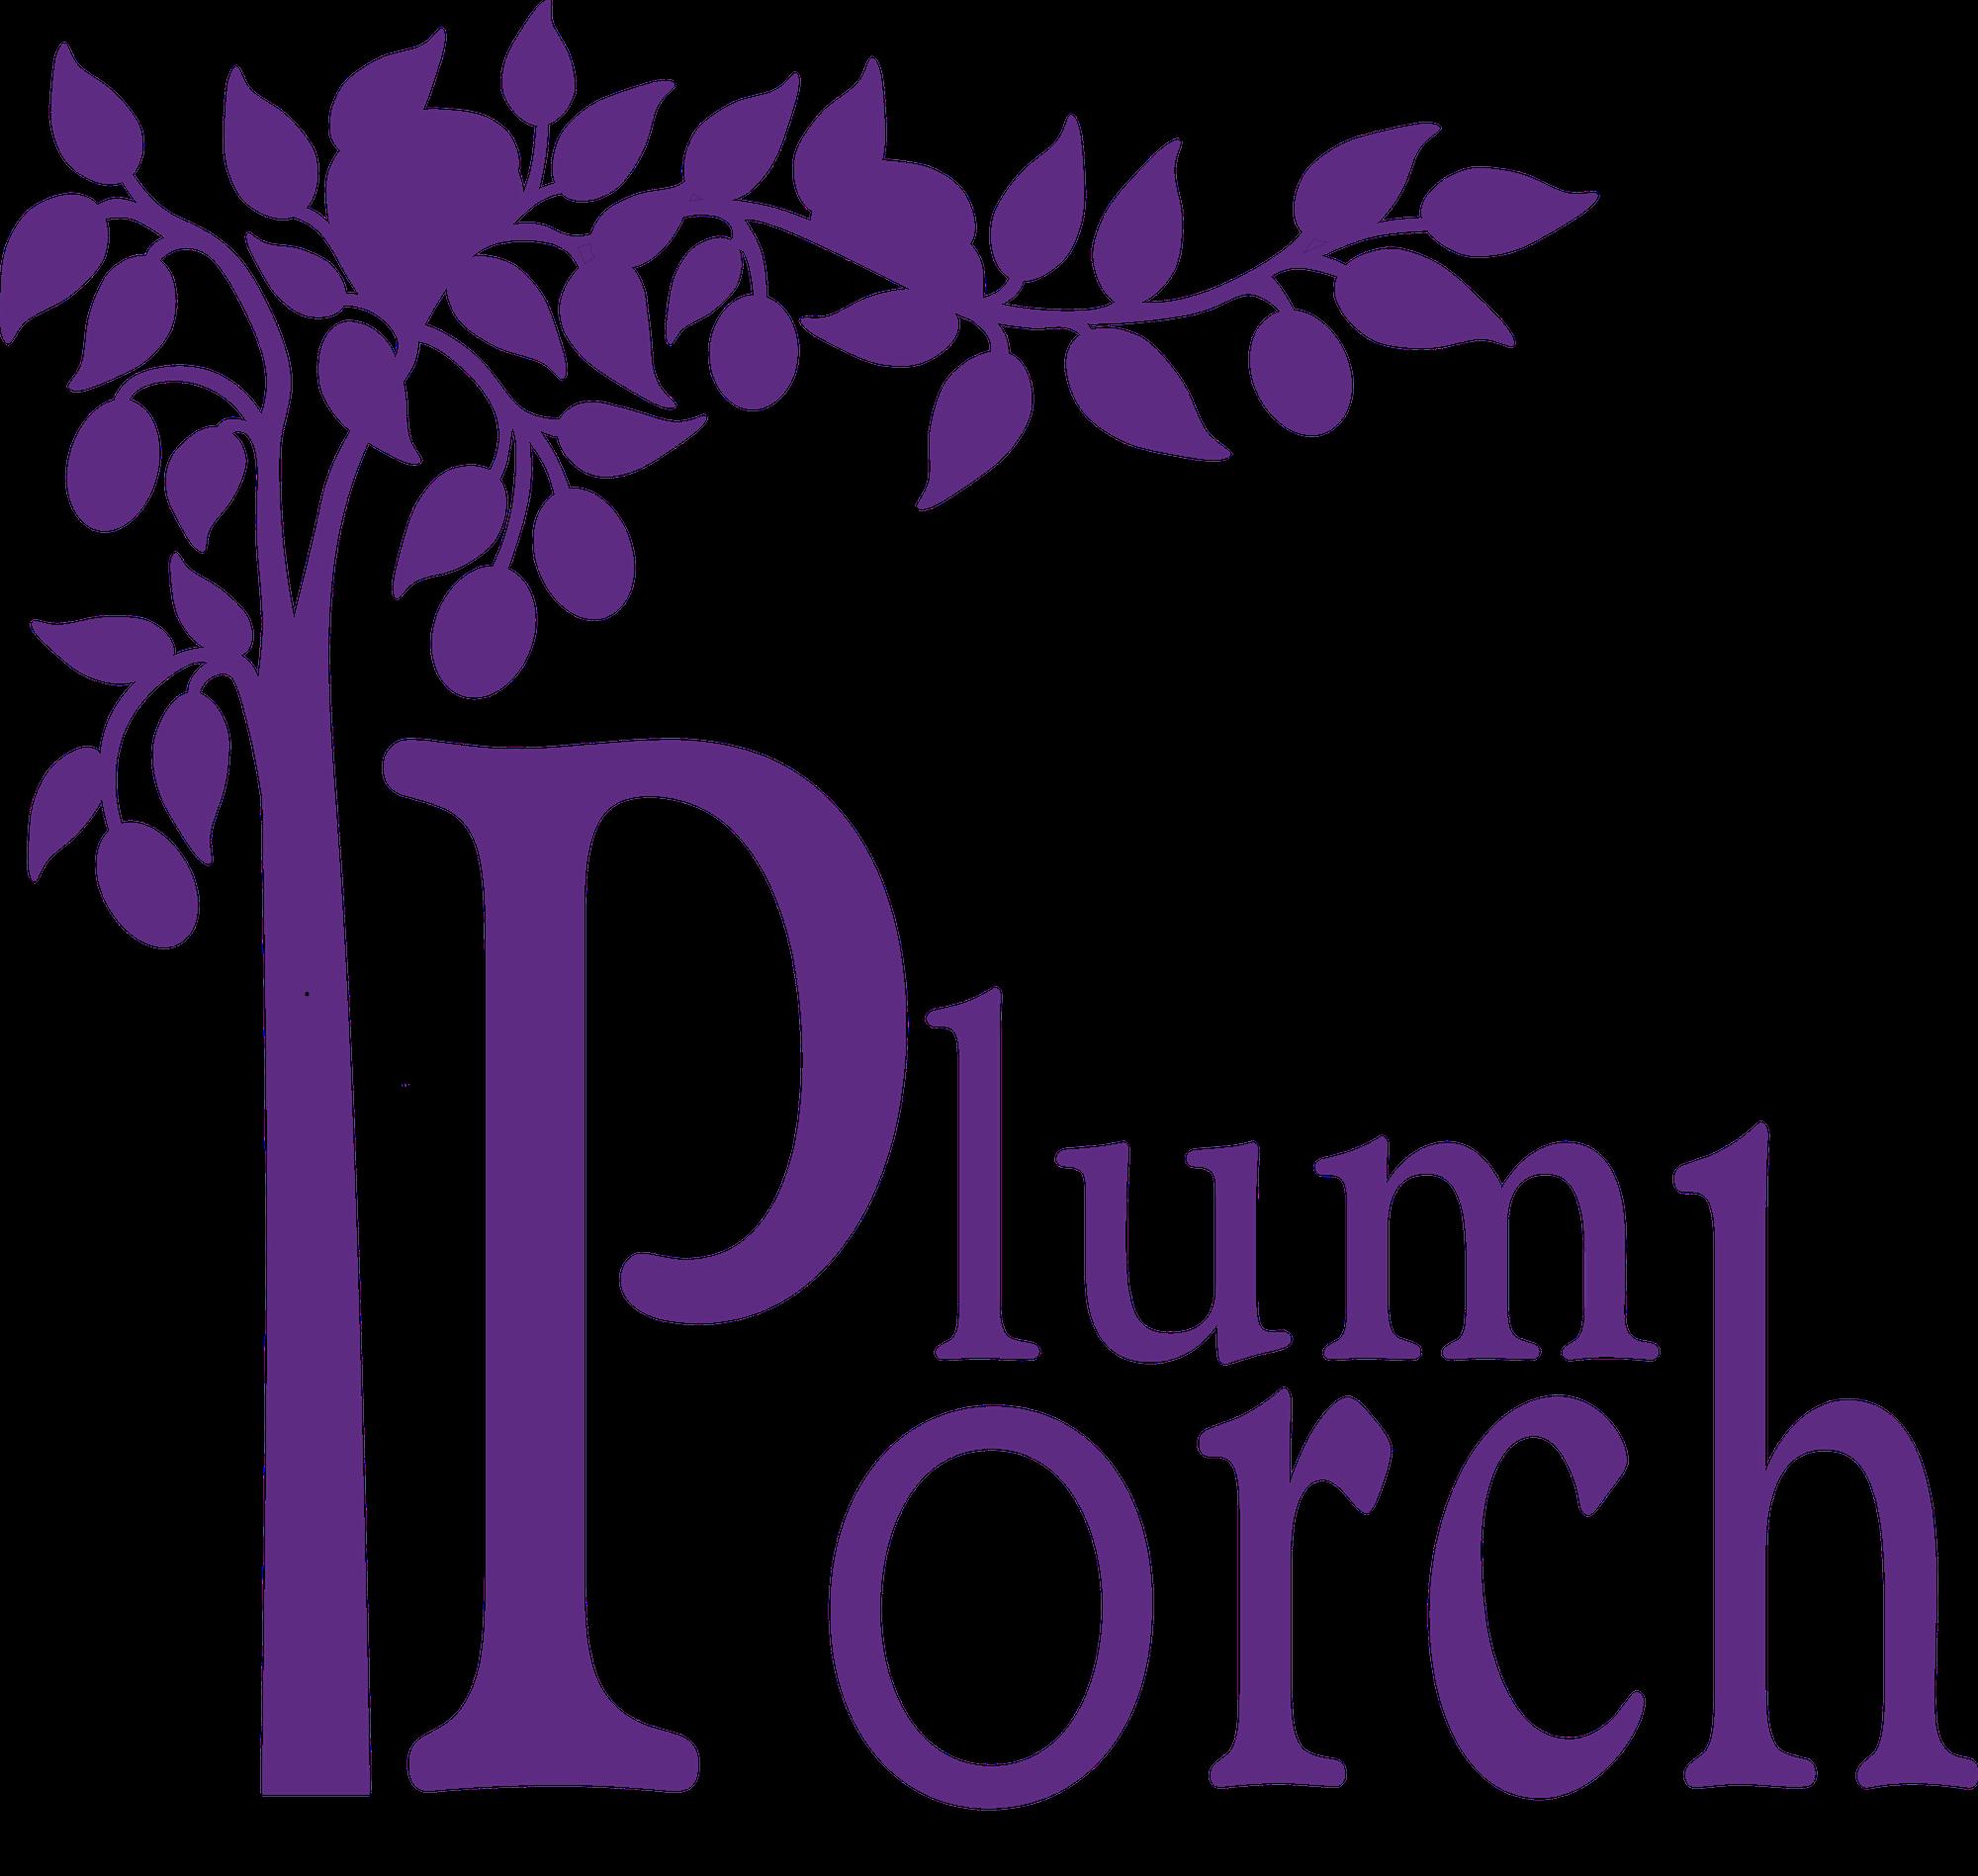 Work at Plum Porch